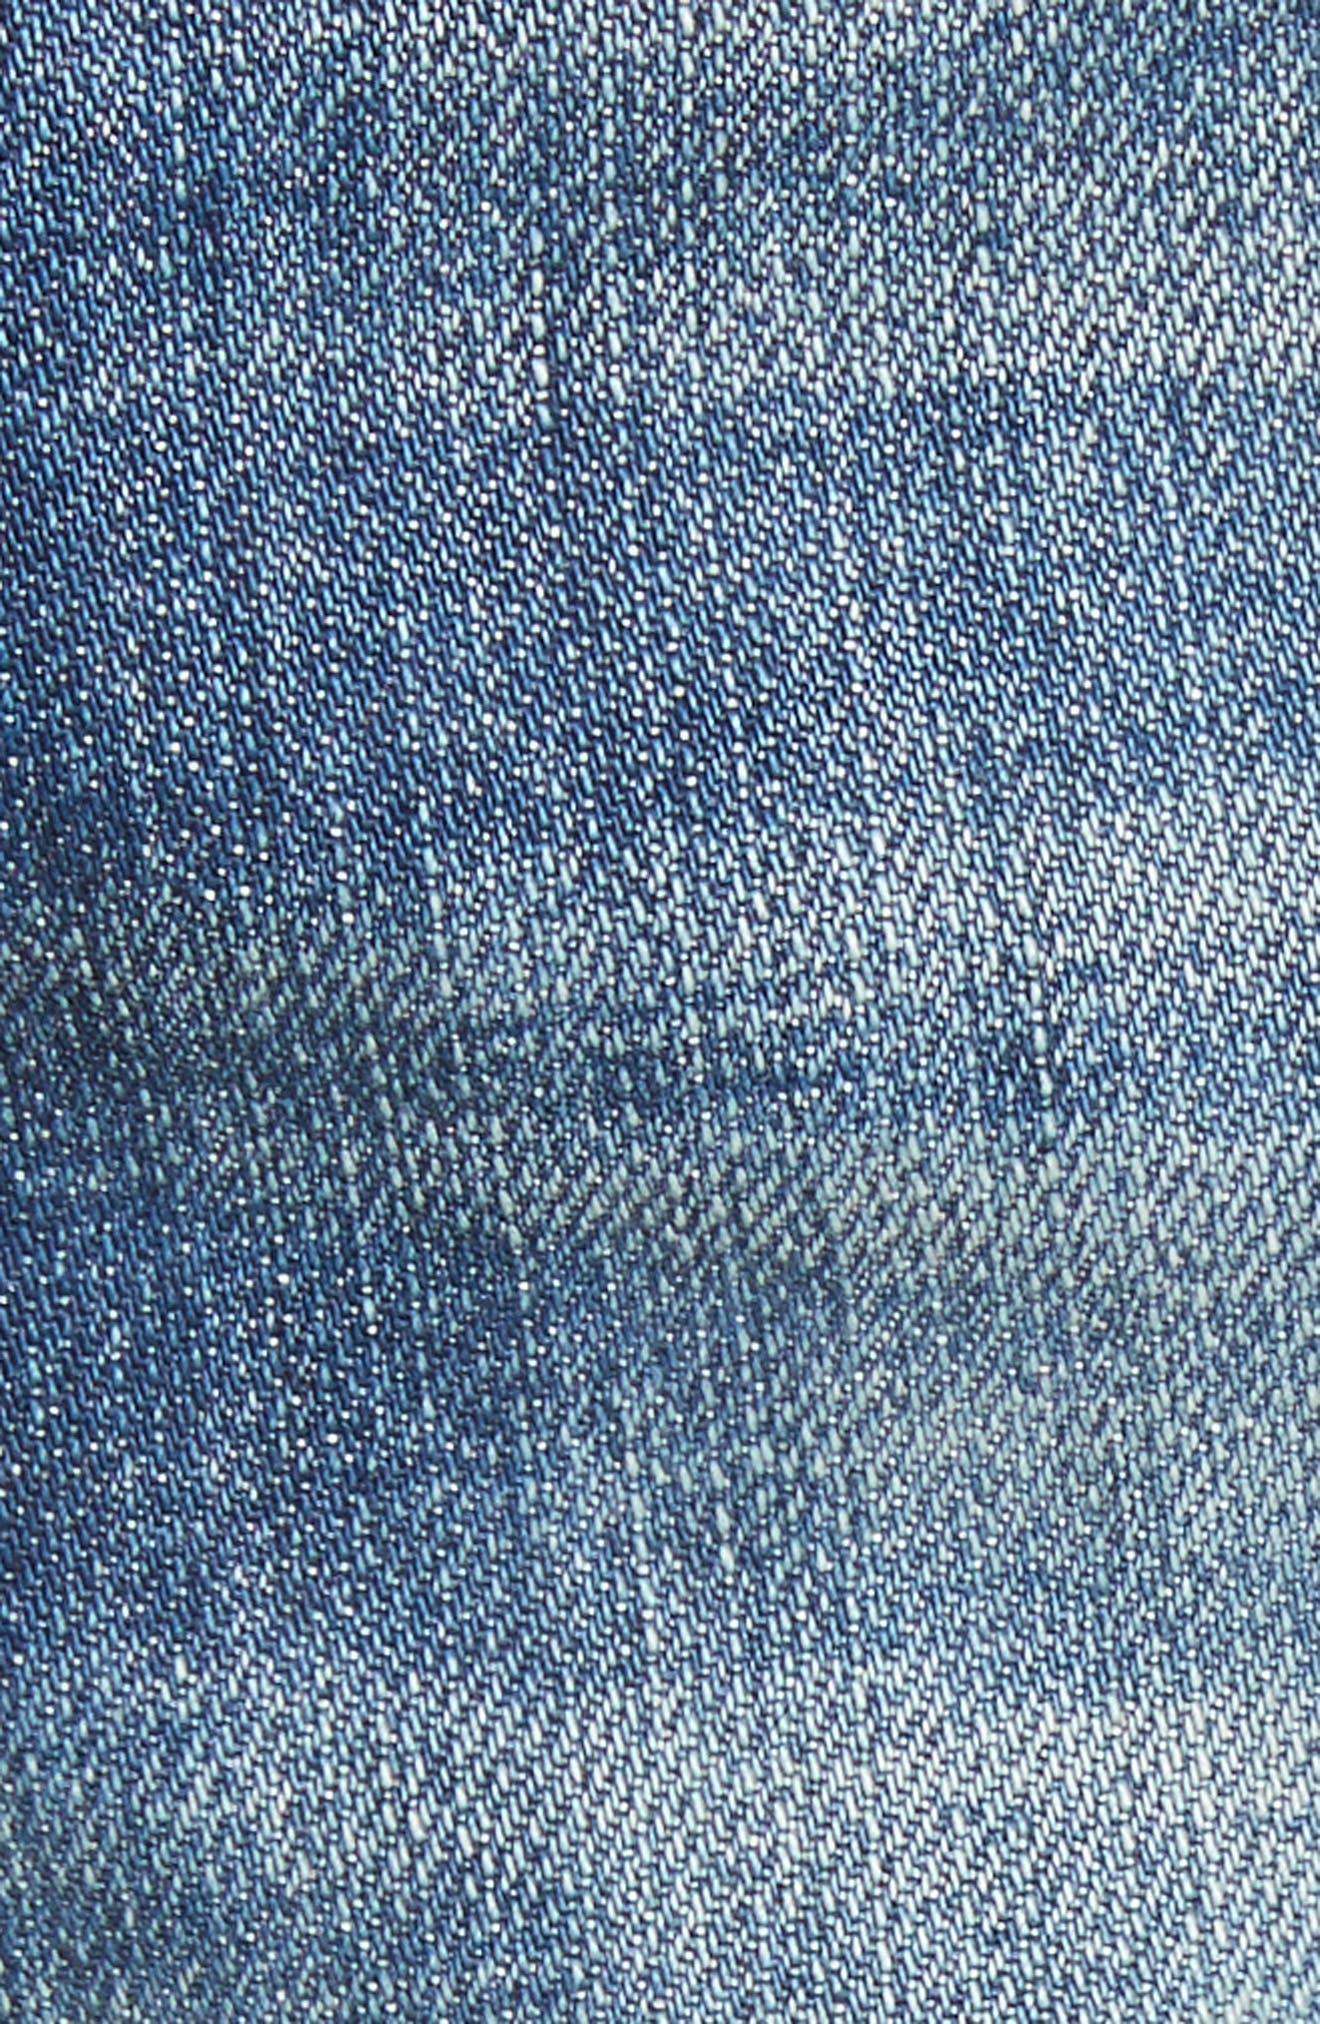 Margaux High Waist Denim Shorts,                             Alternate thumbnail 5, color,                             420